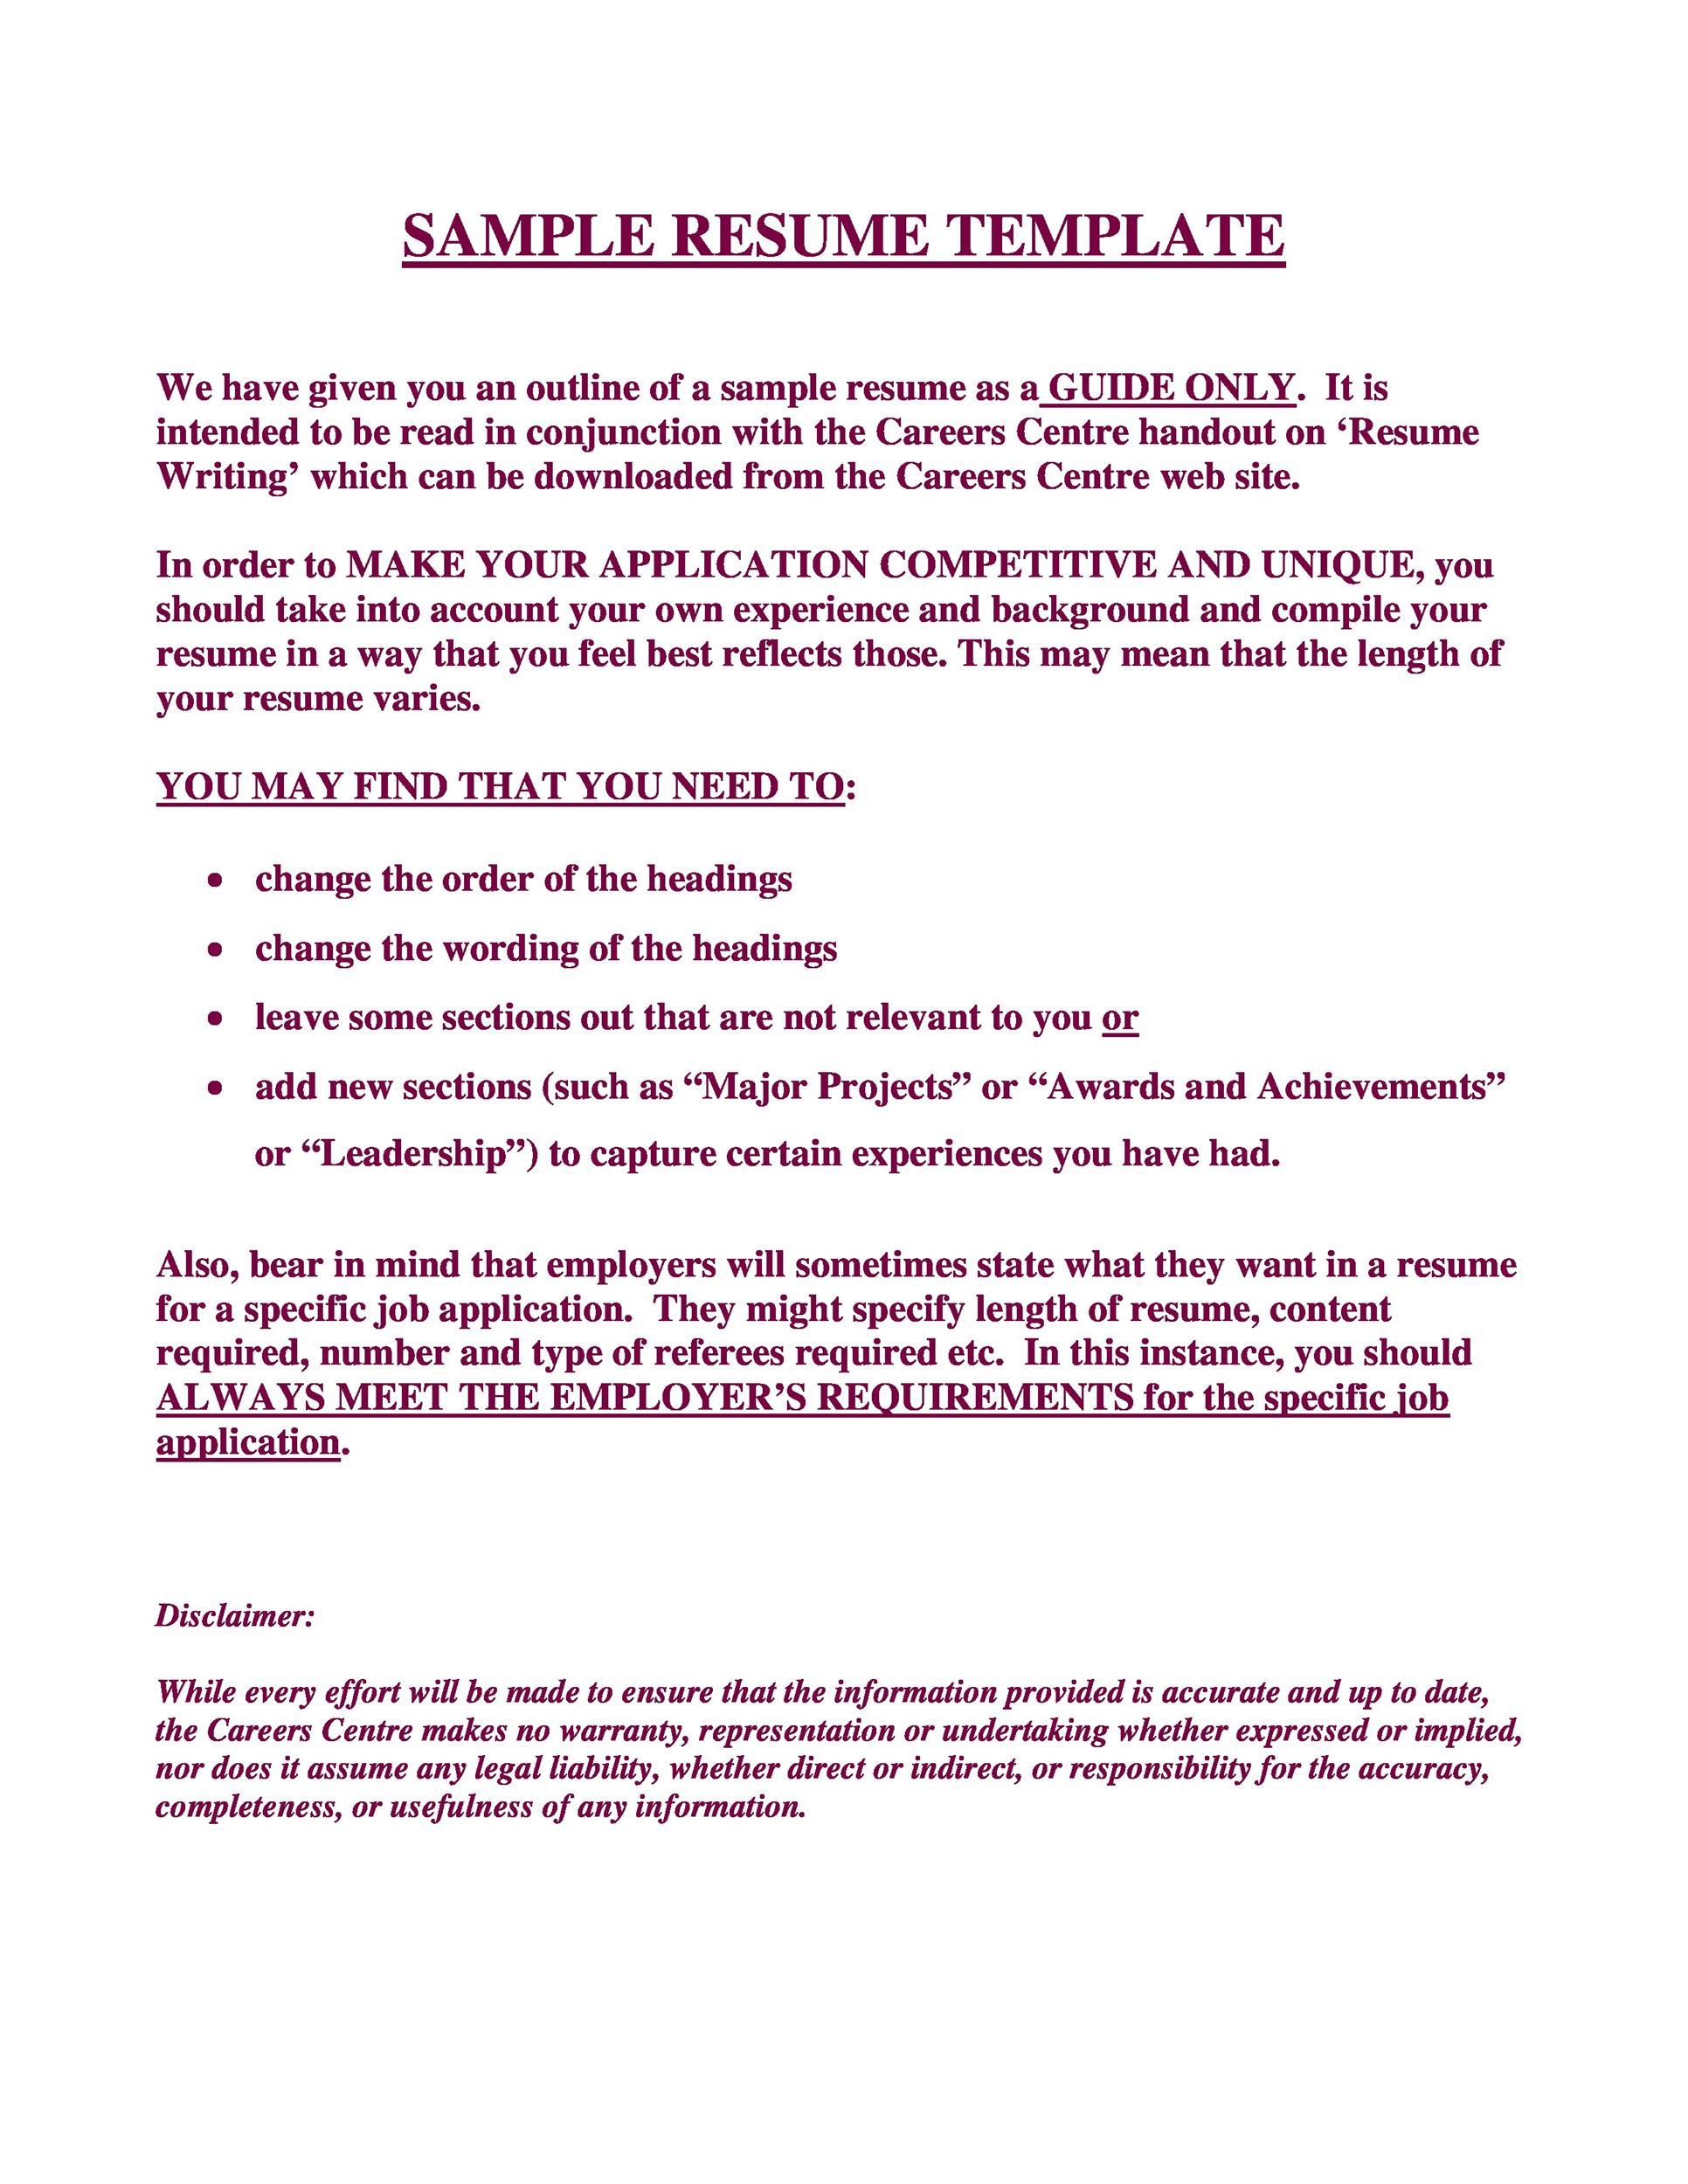 Free curriculum vitae template 18